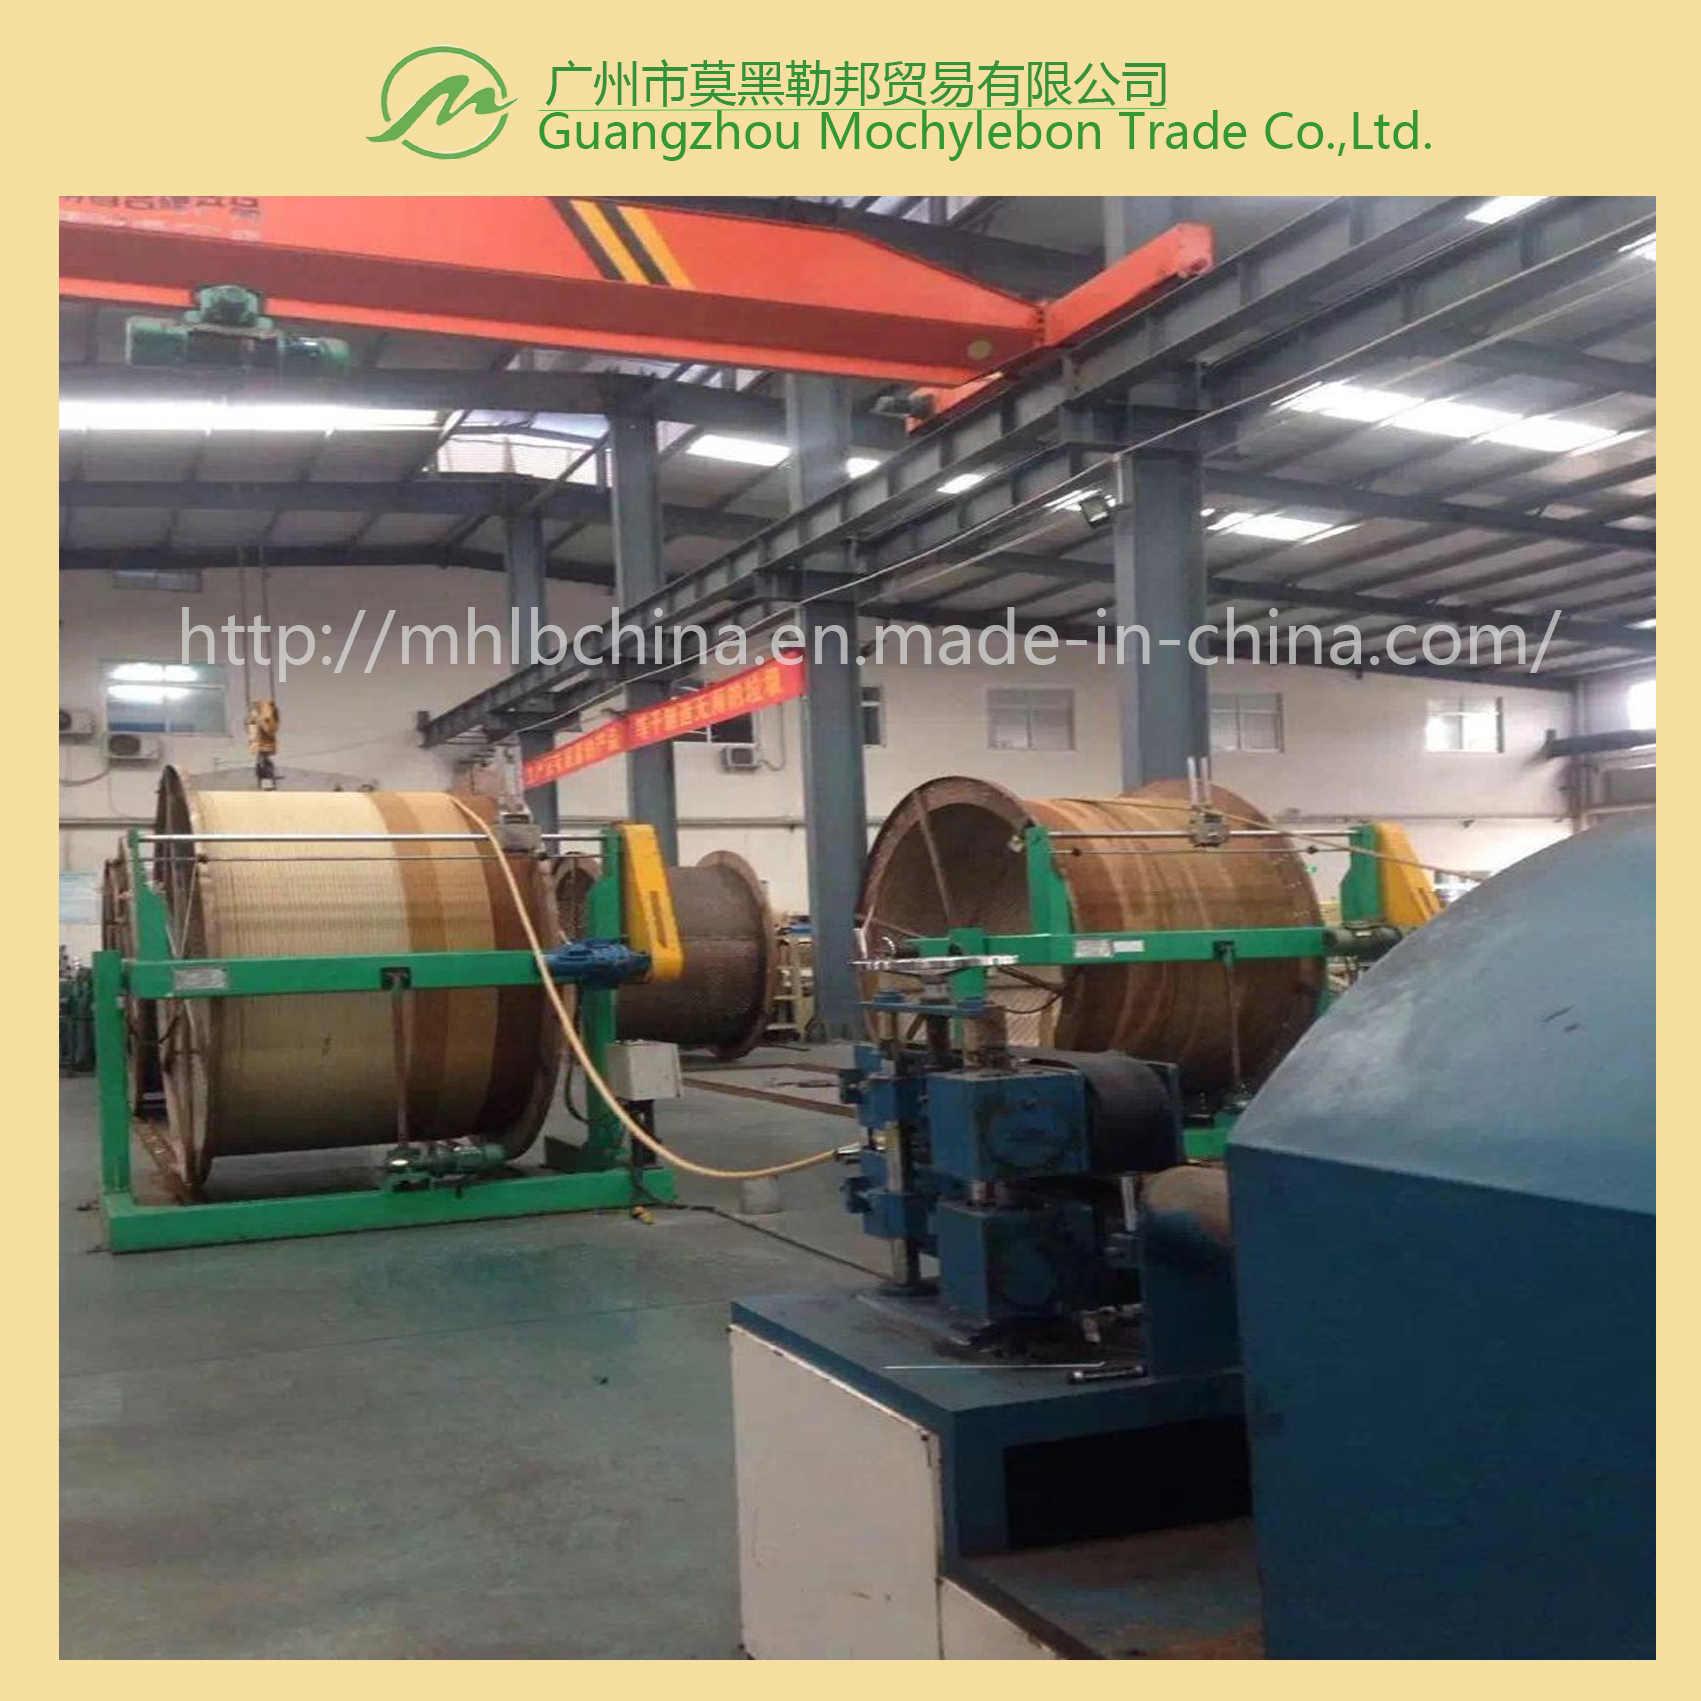 Wire Braided Hydraulic Hose for Coal Mine (602-3B-1-1/2)